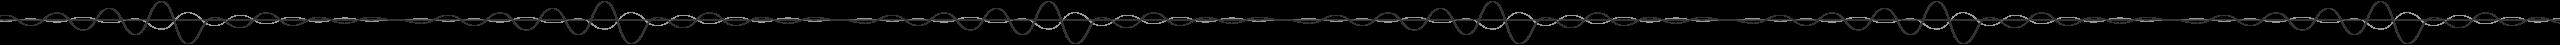 echobell-wave-Pic1